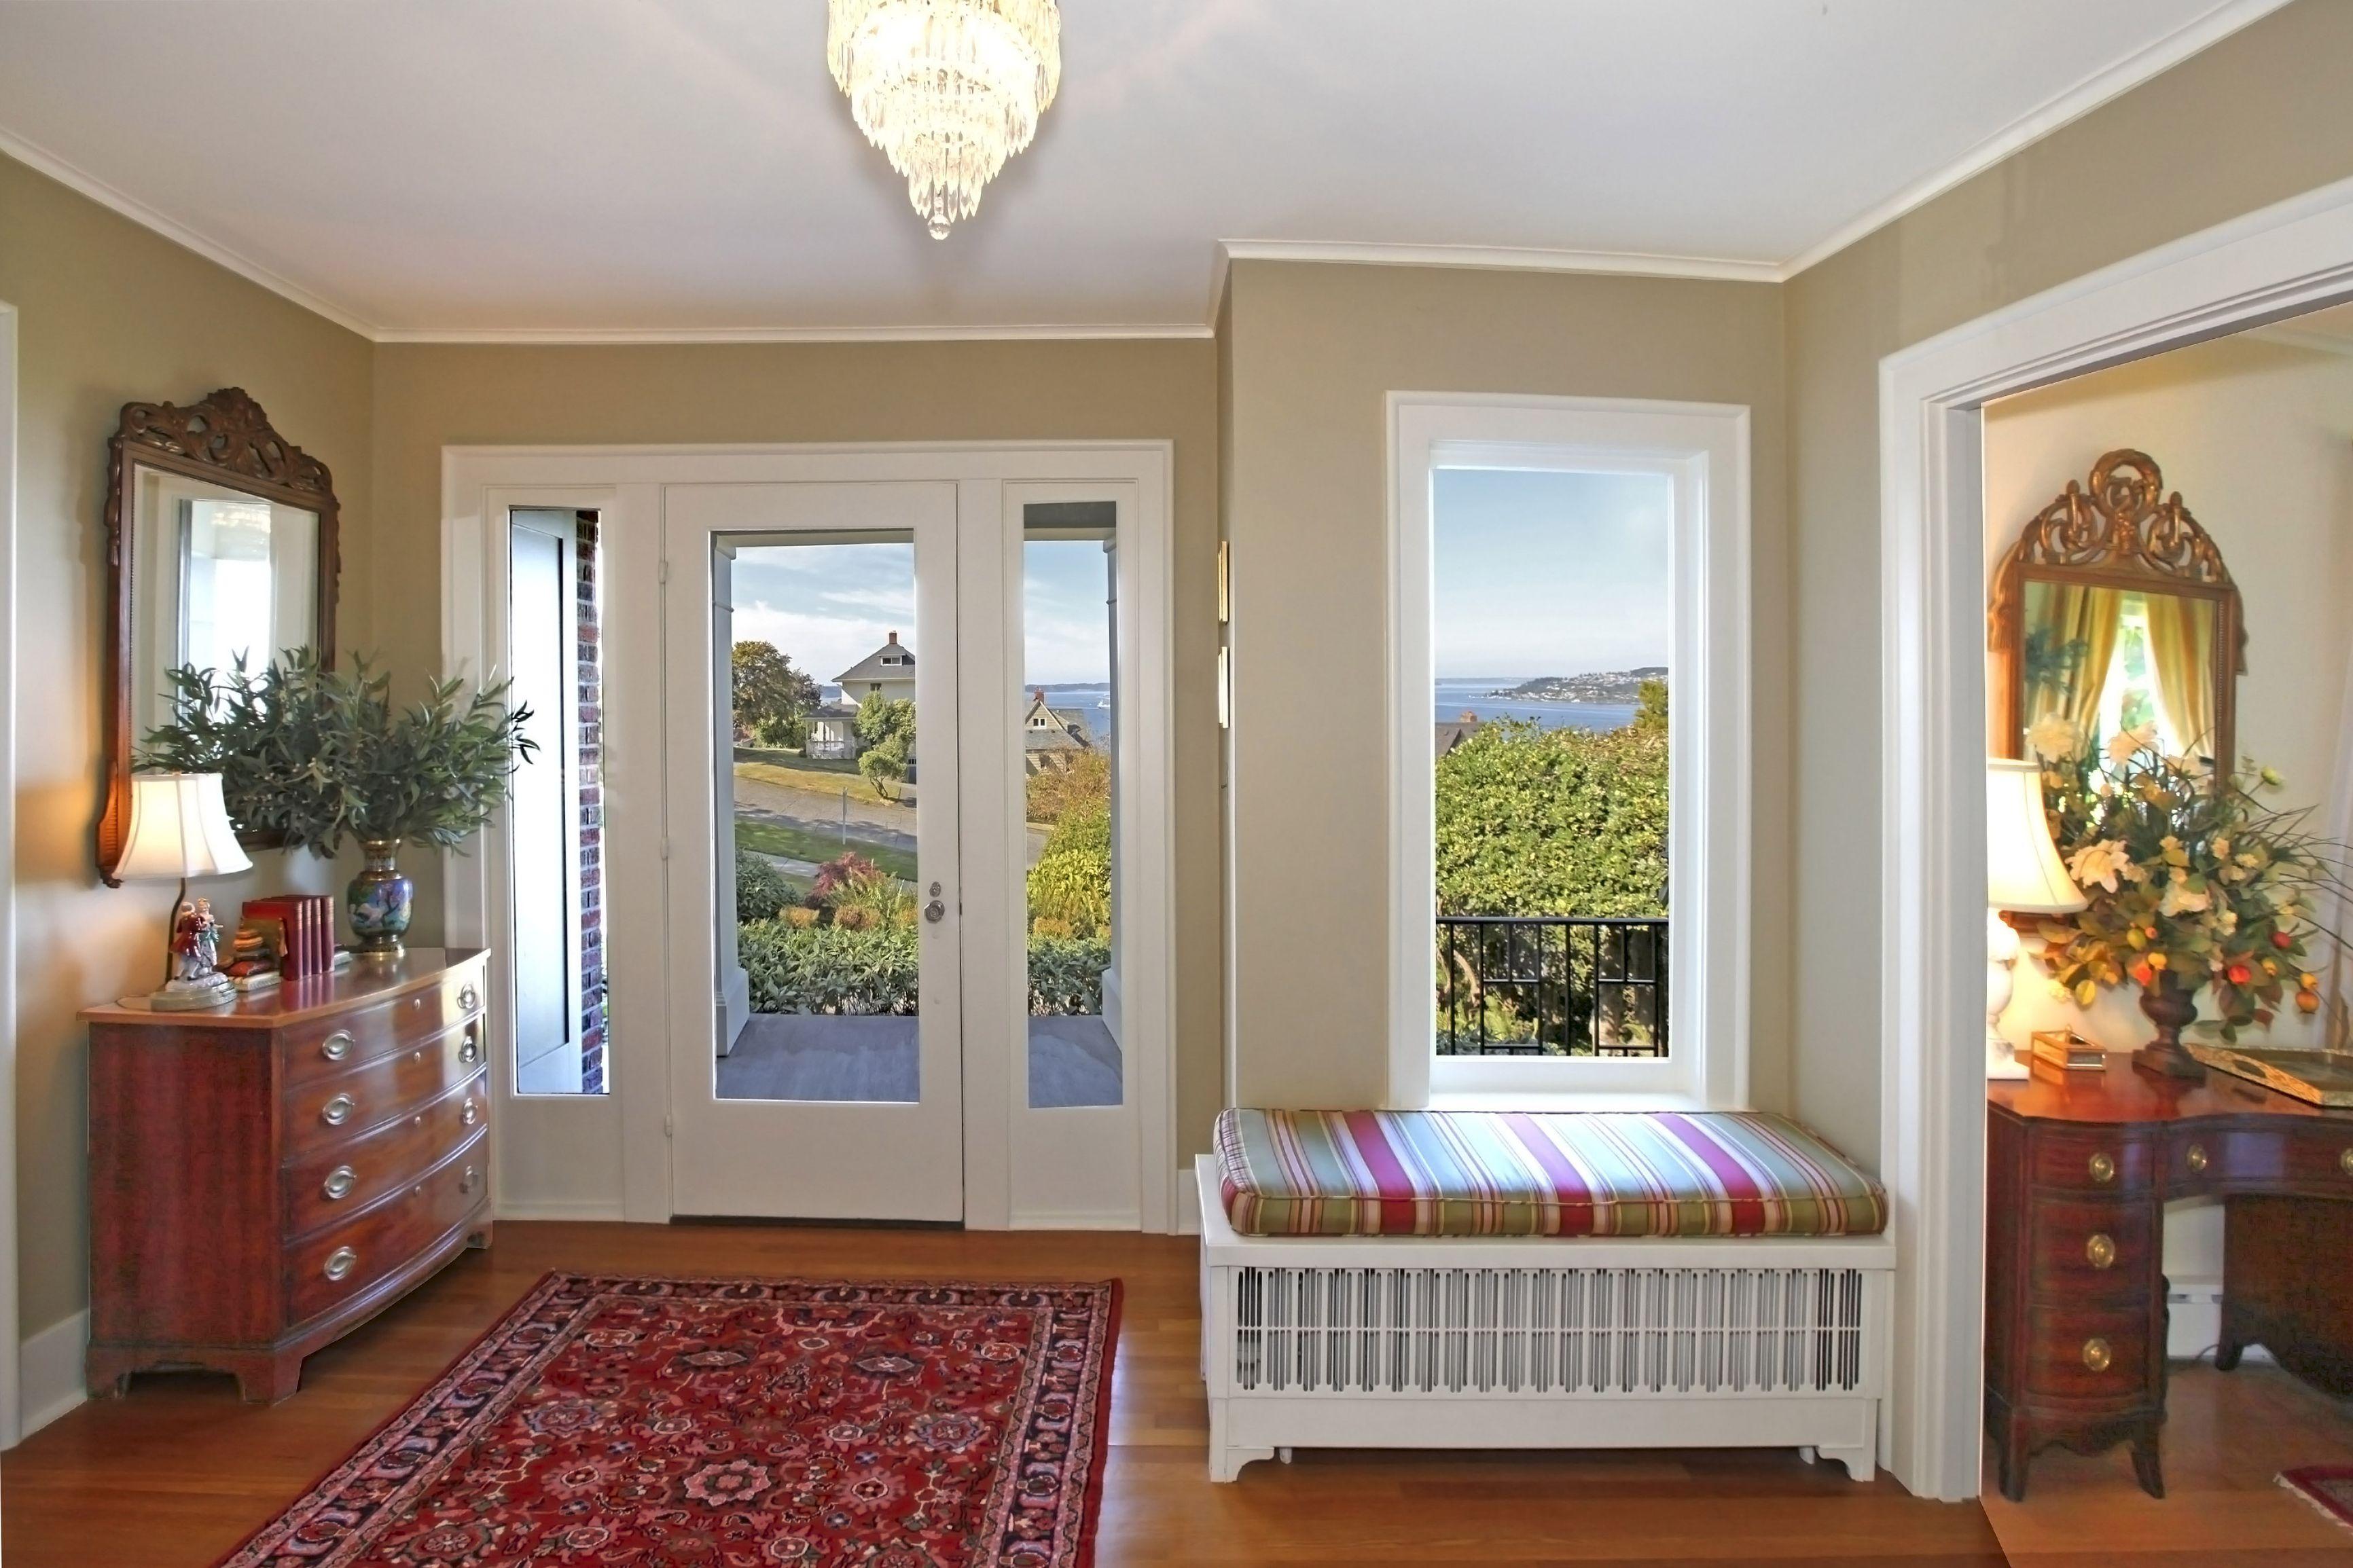 best esempio di ingresso arredato in stile classico with